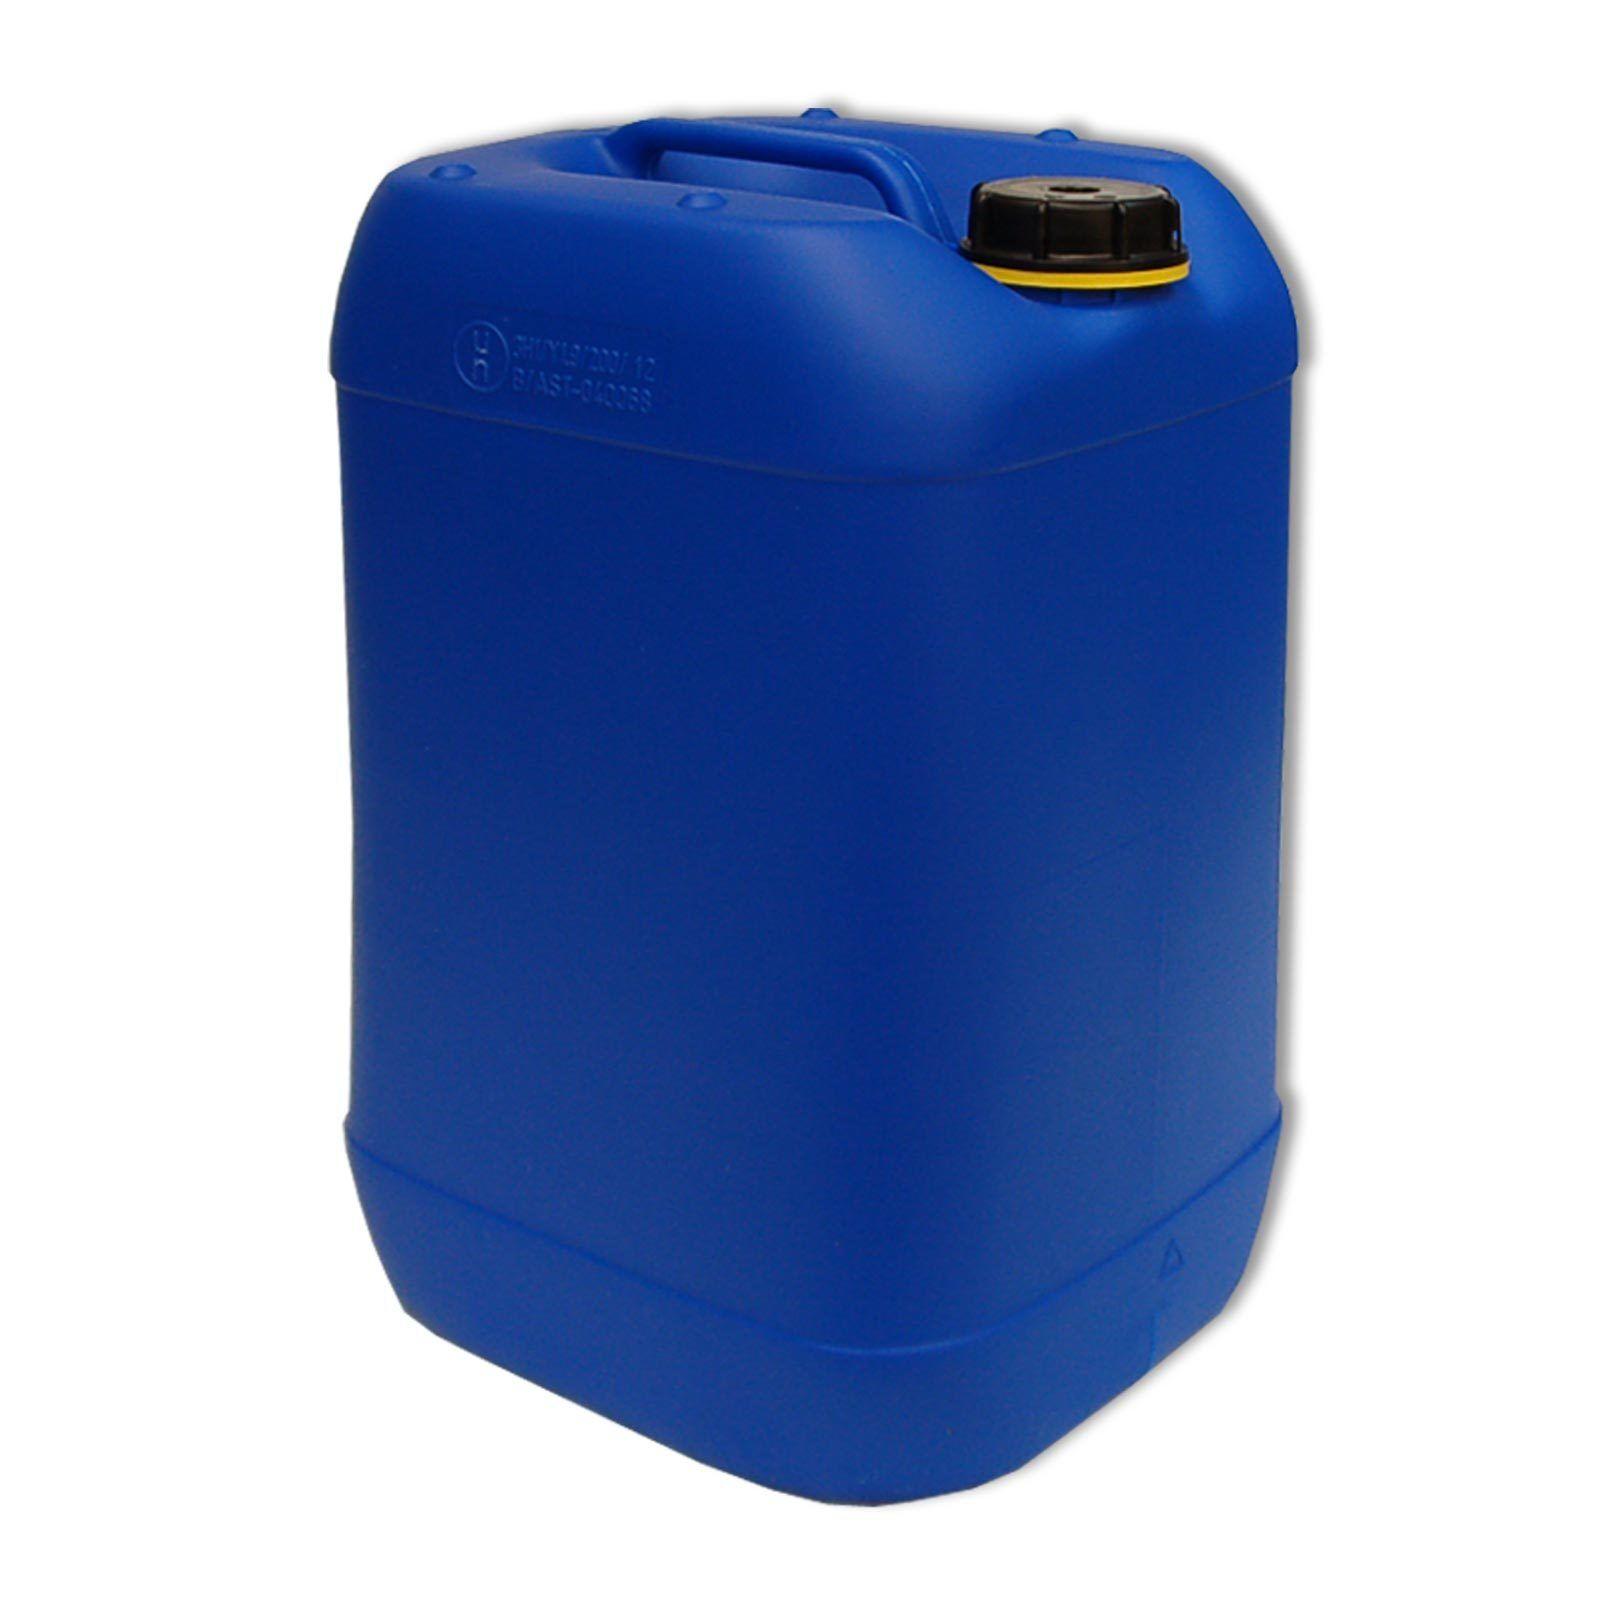 Bidon plastique 25 L, DIN 61 Bleu, HDPE alimentaire fabriq. fabriq. fabriq. en Allemagne (22248) ff3f03